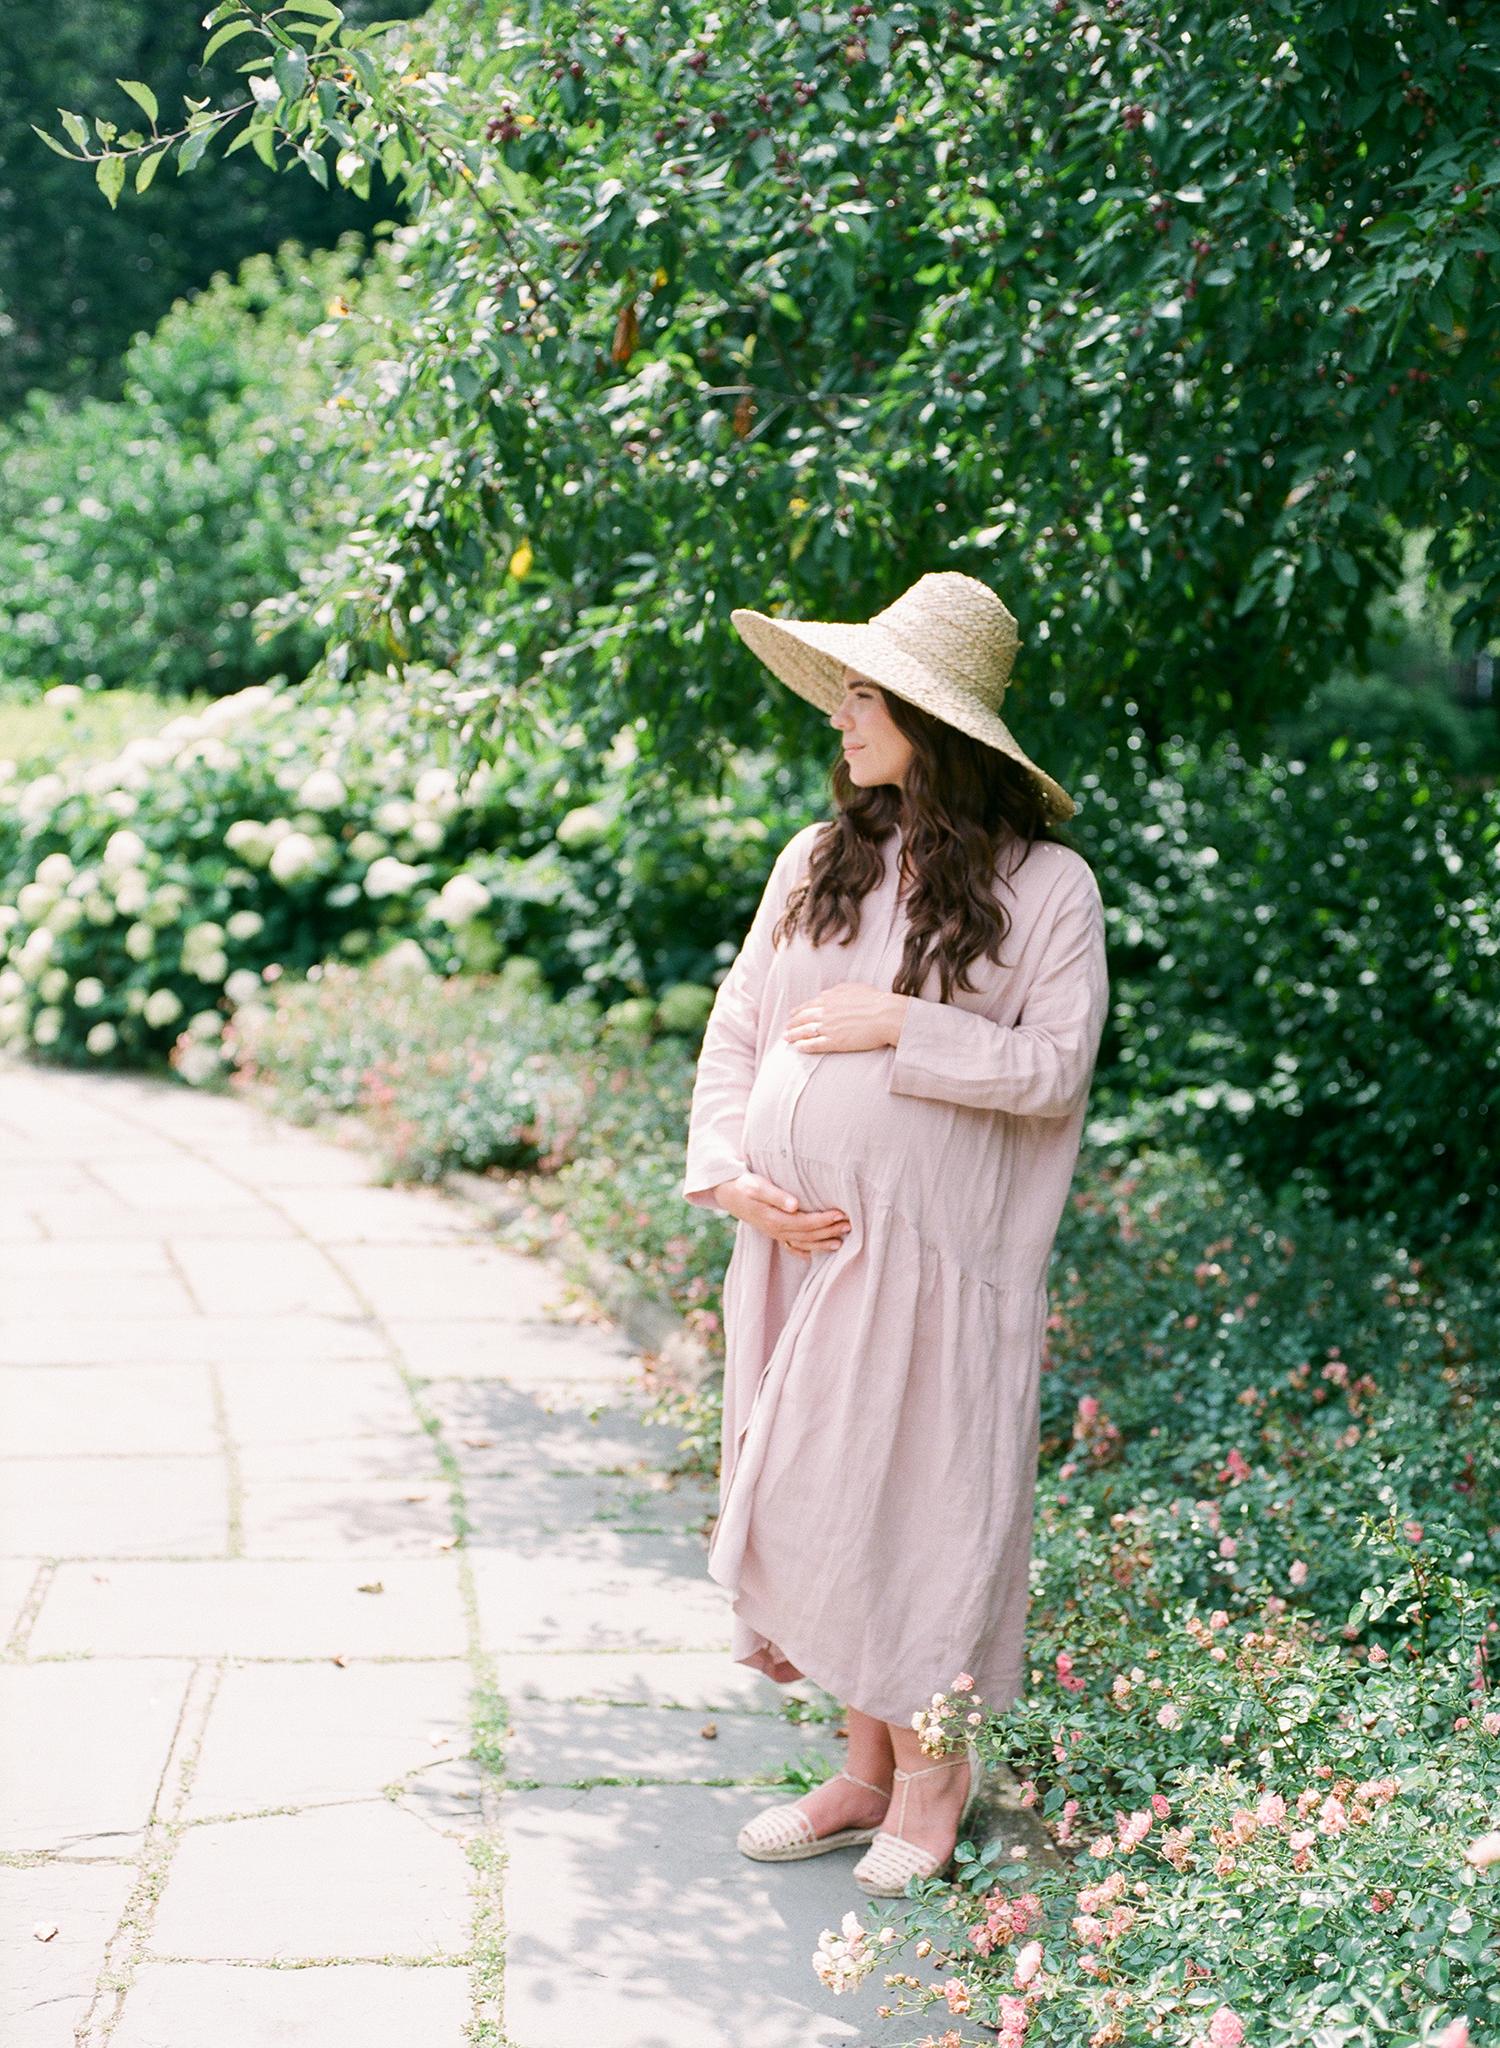 Natasha-maternity-107.jpg